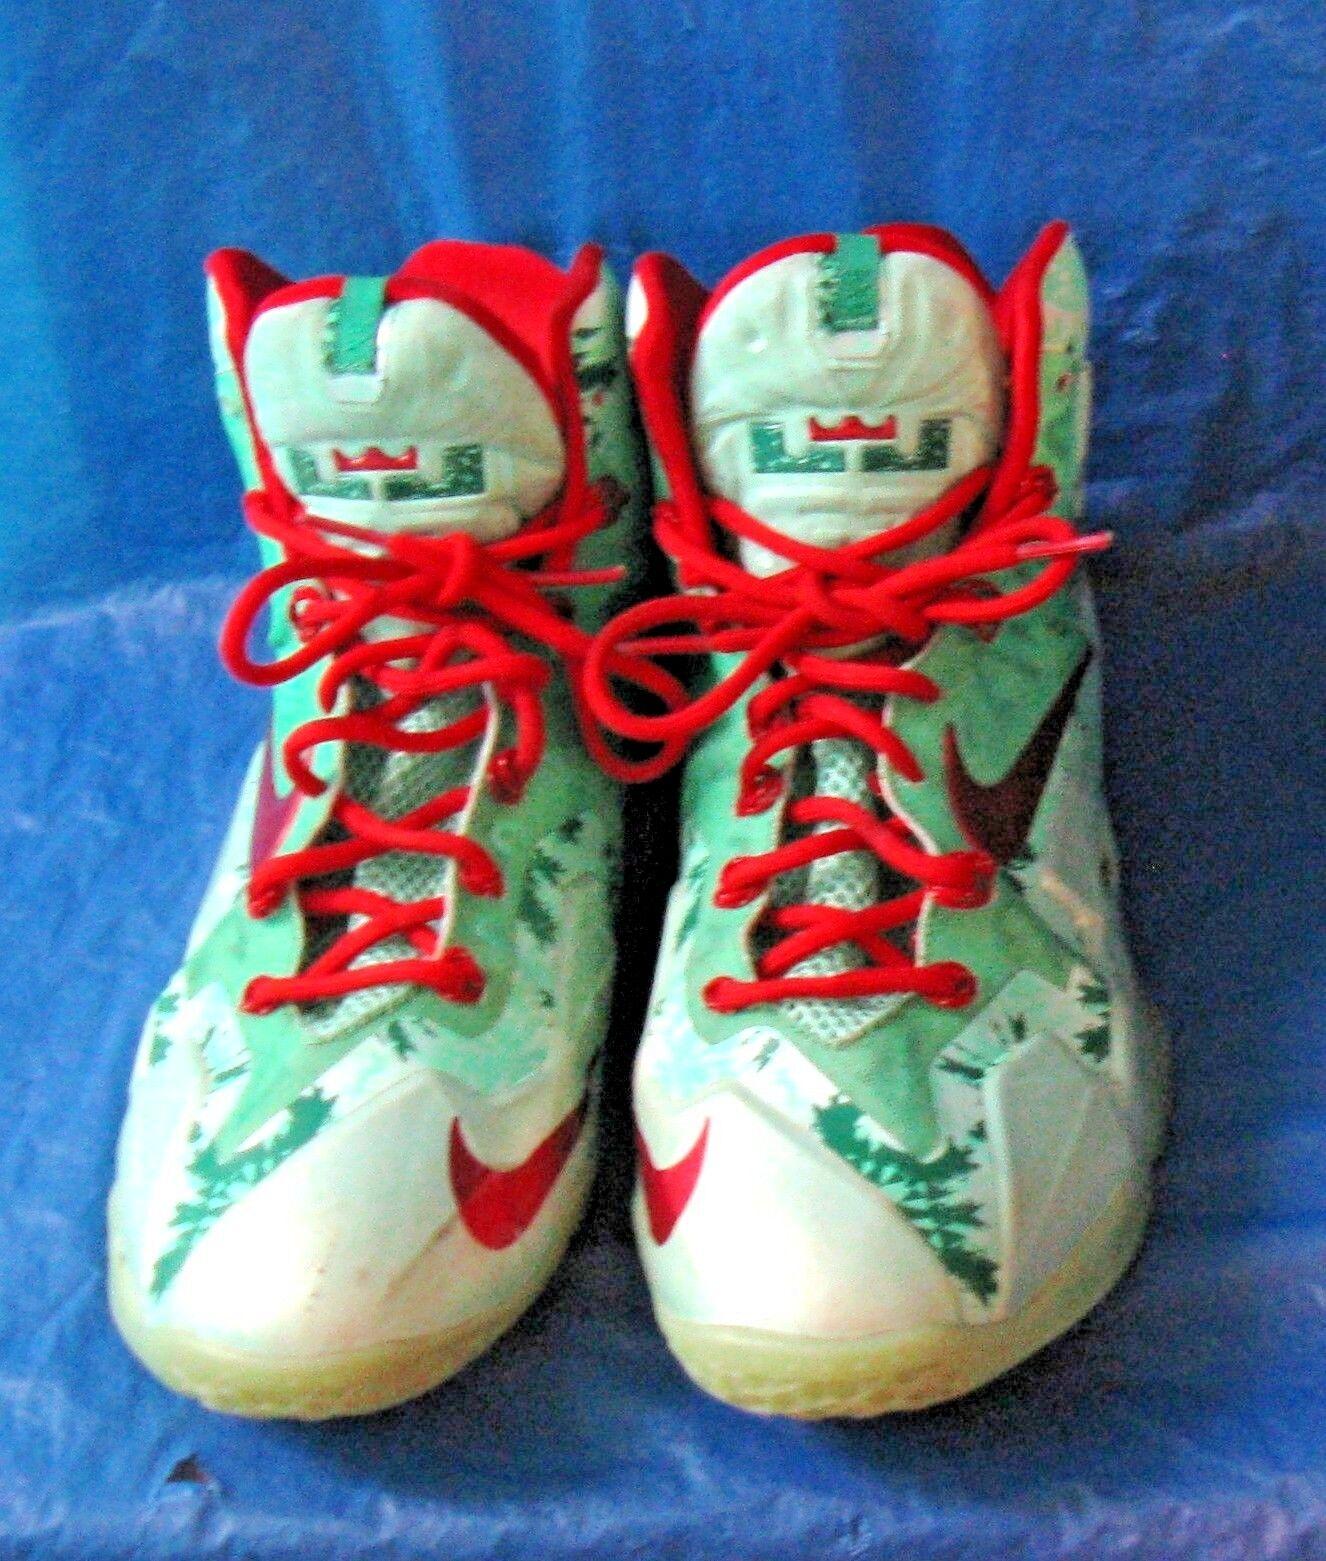 Nike lebron xi schuhe 11 weihnachten schuhe xi (größe 12) 01faa4 ...